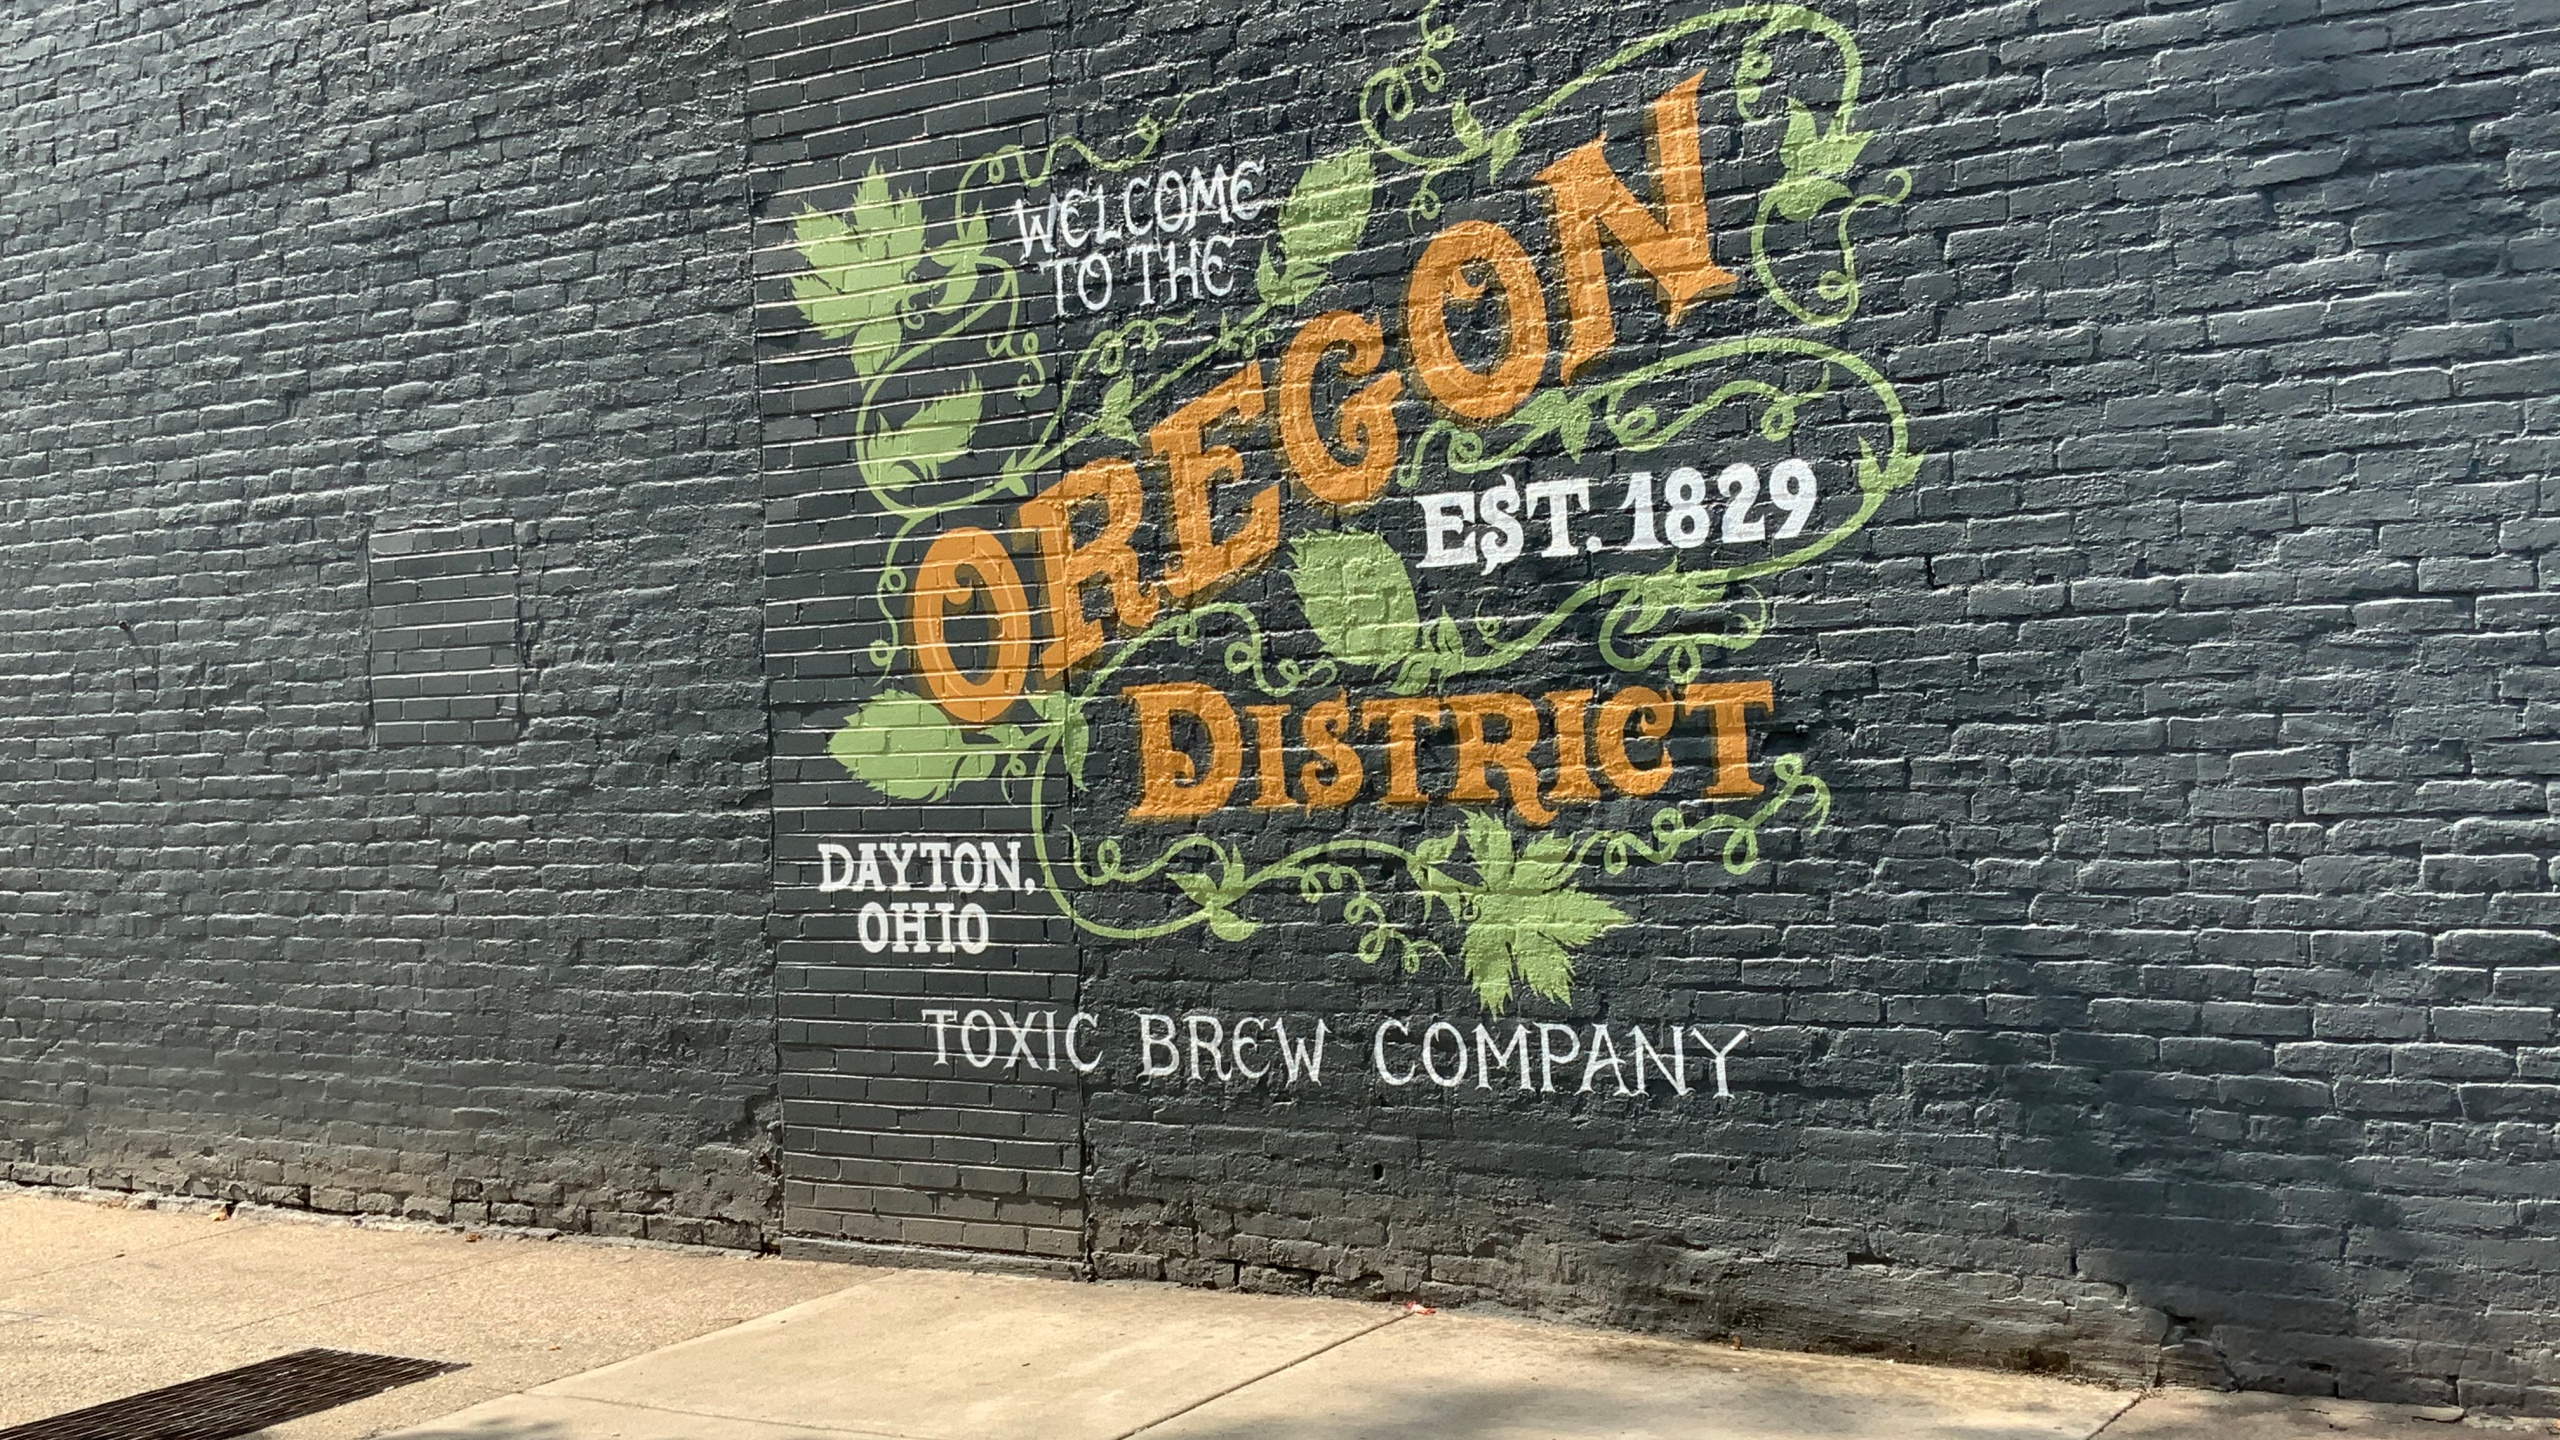 Oregon District - Toxic Brew